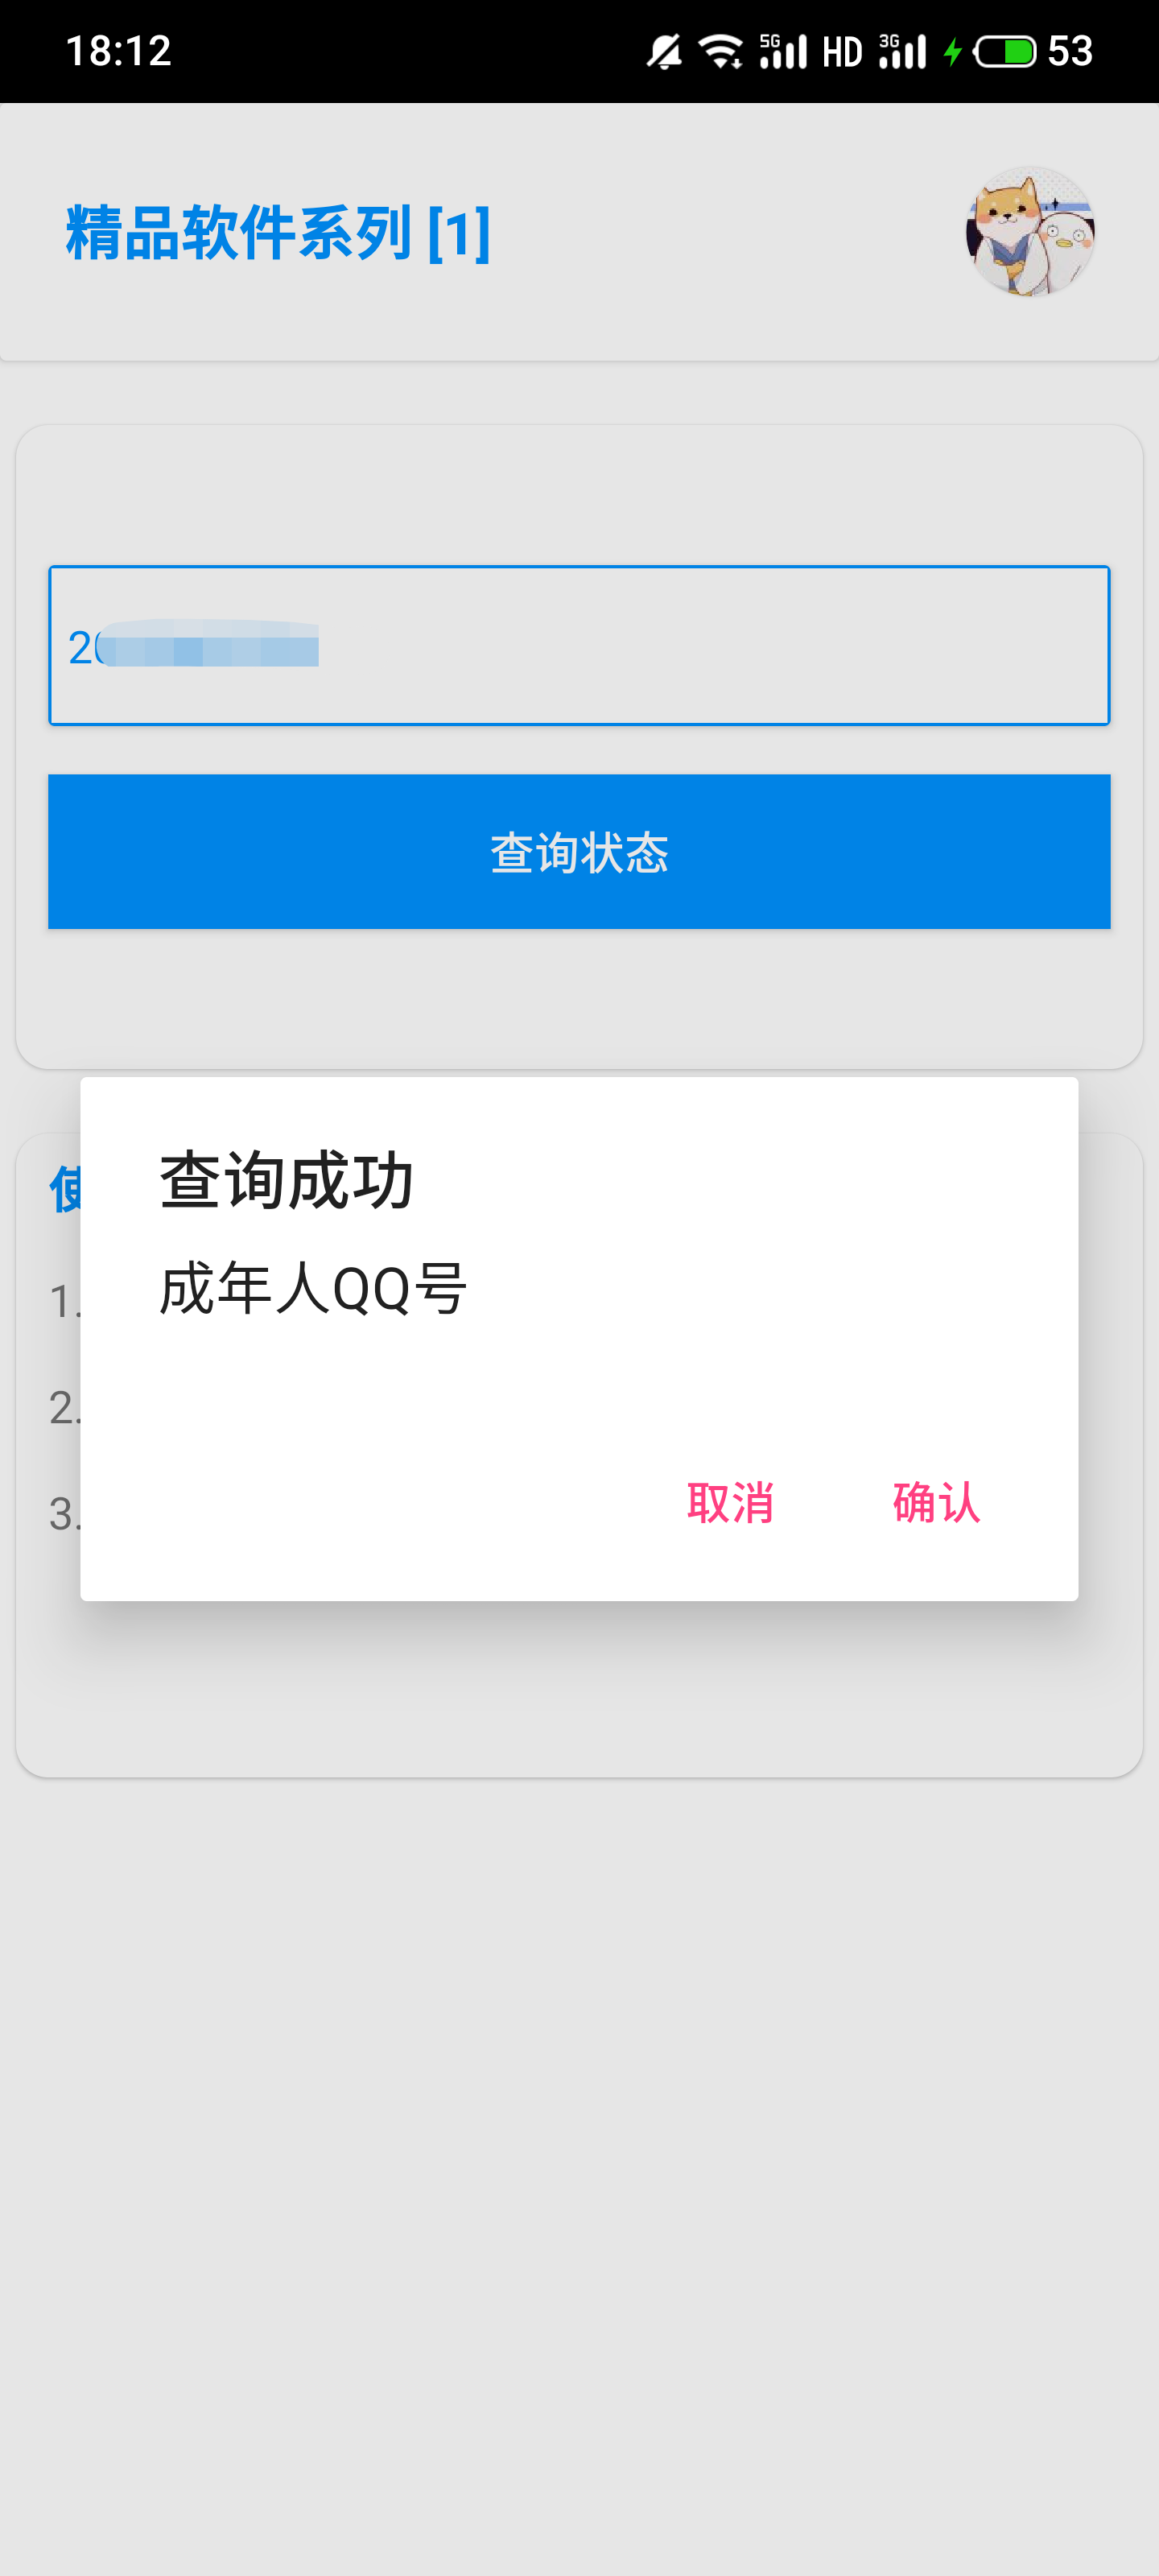 QQ查询成年v1.0 » 快看看和你聊天的TA是否成年了